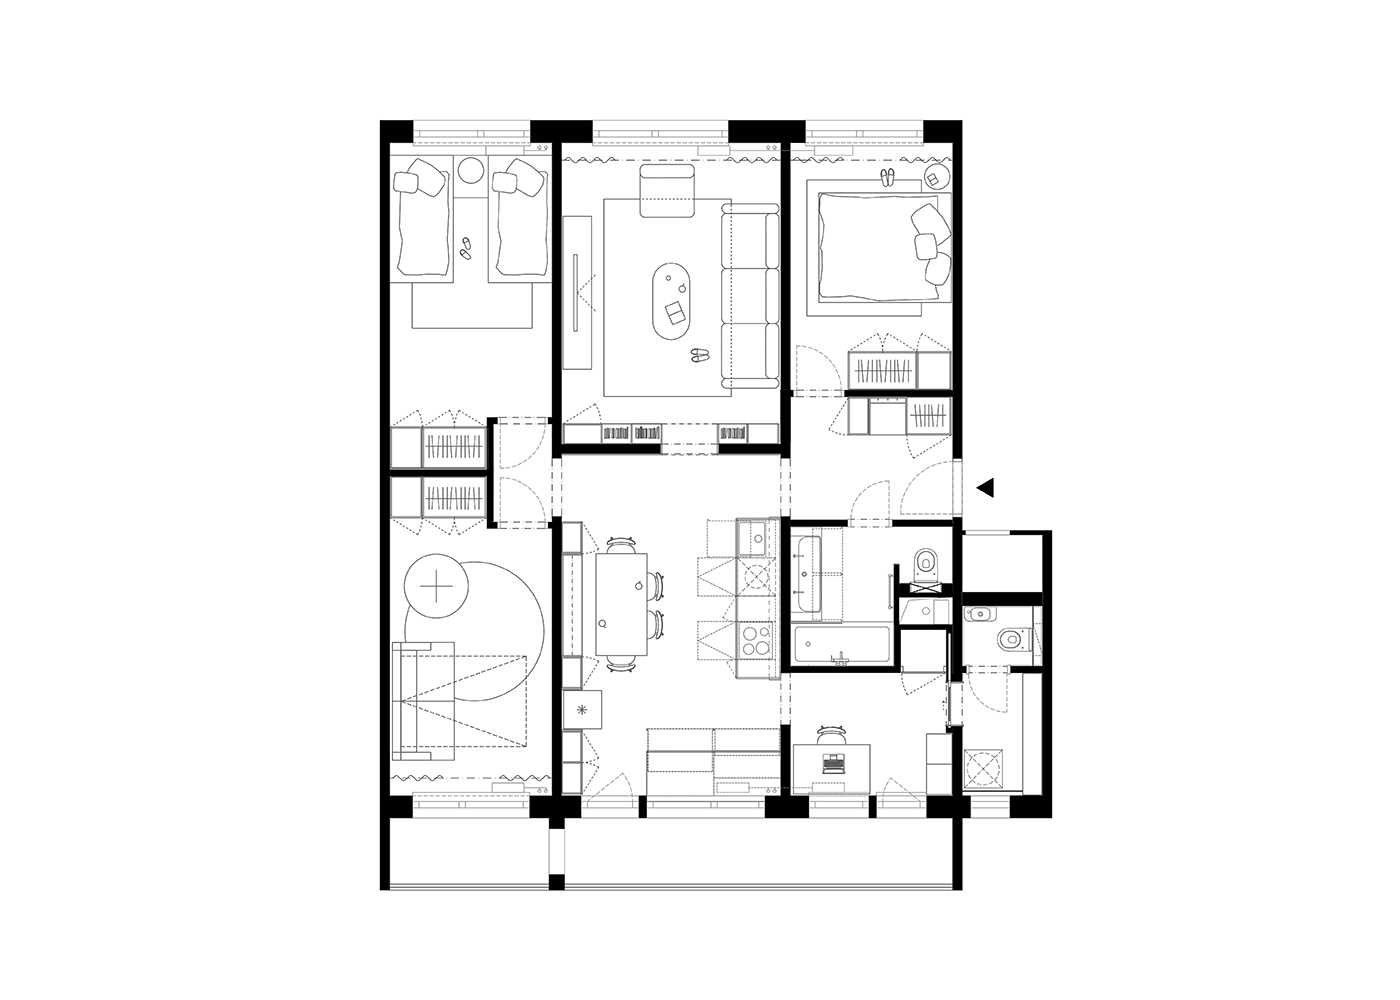 noiz-architekti-bratislava-pod-rovnicami-05